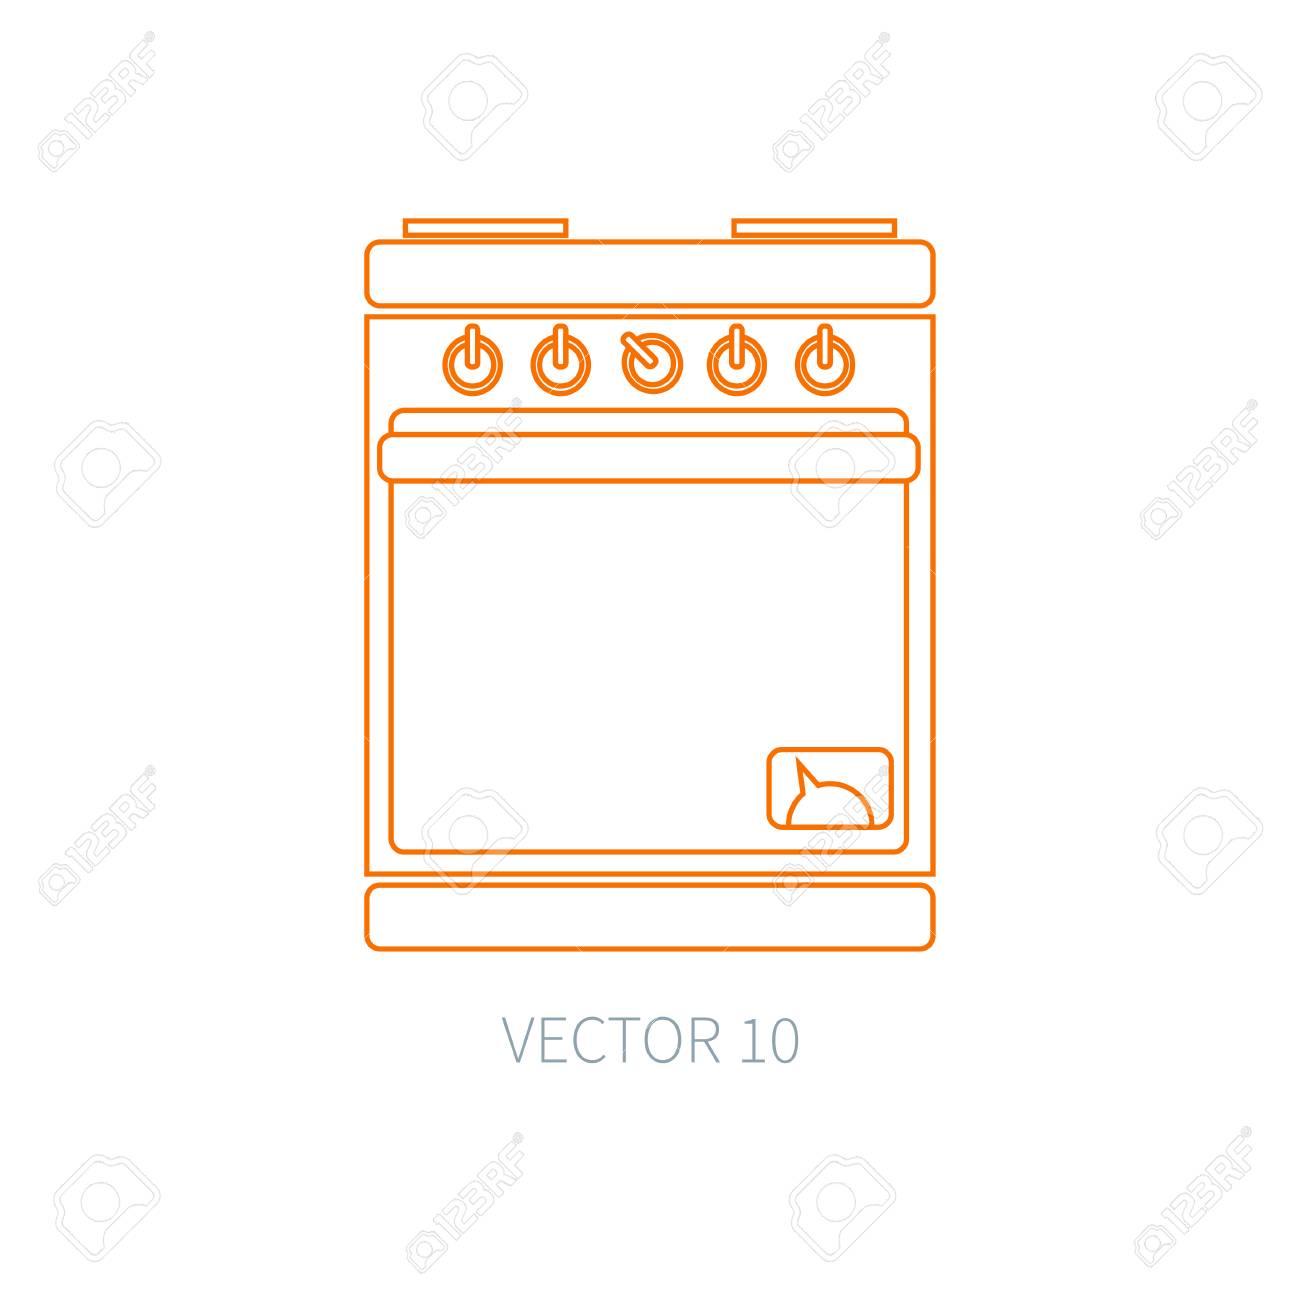 Iconos De Vector Línea Plana Utensilios De Cocina - Horno ...